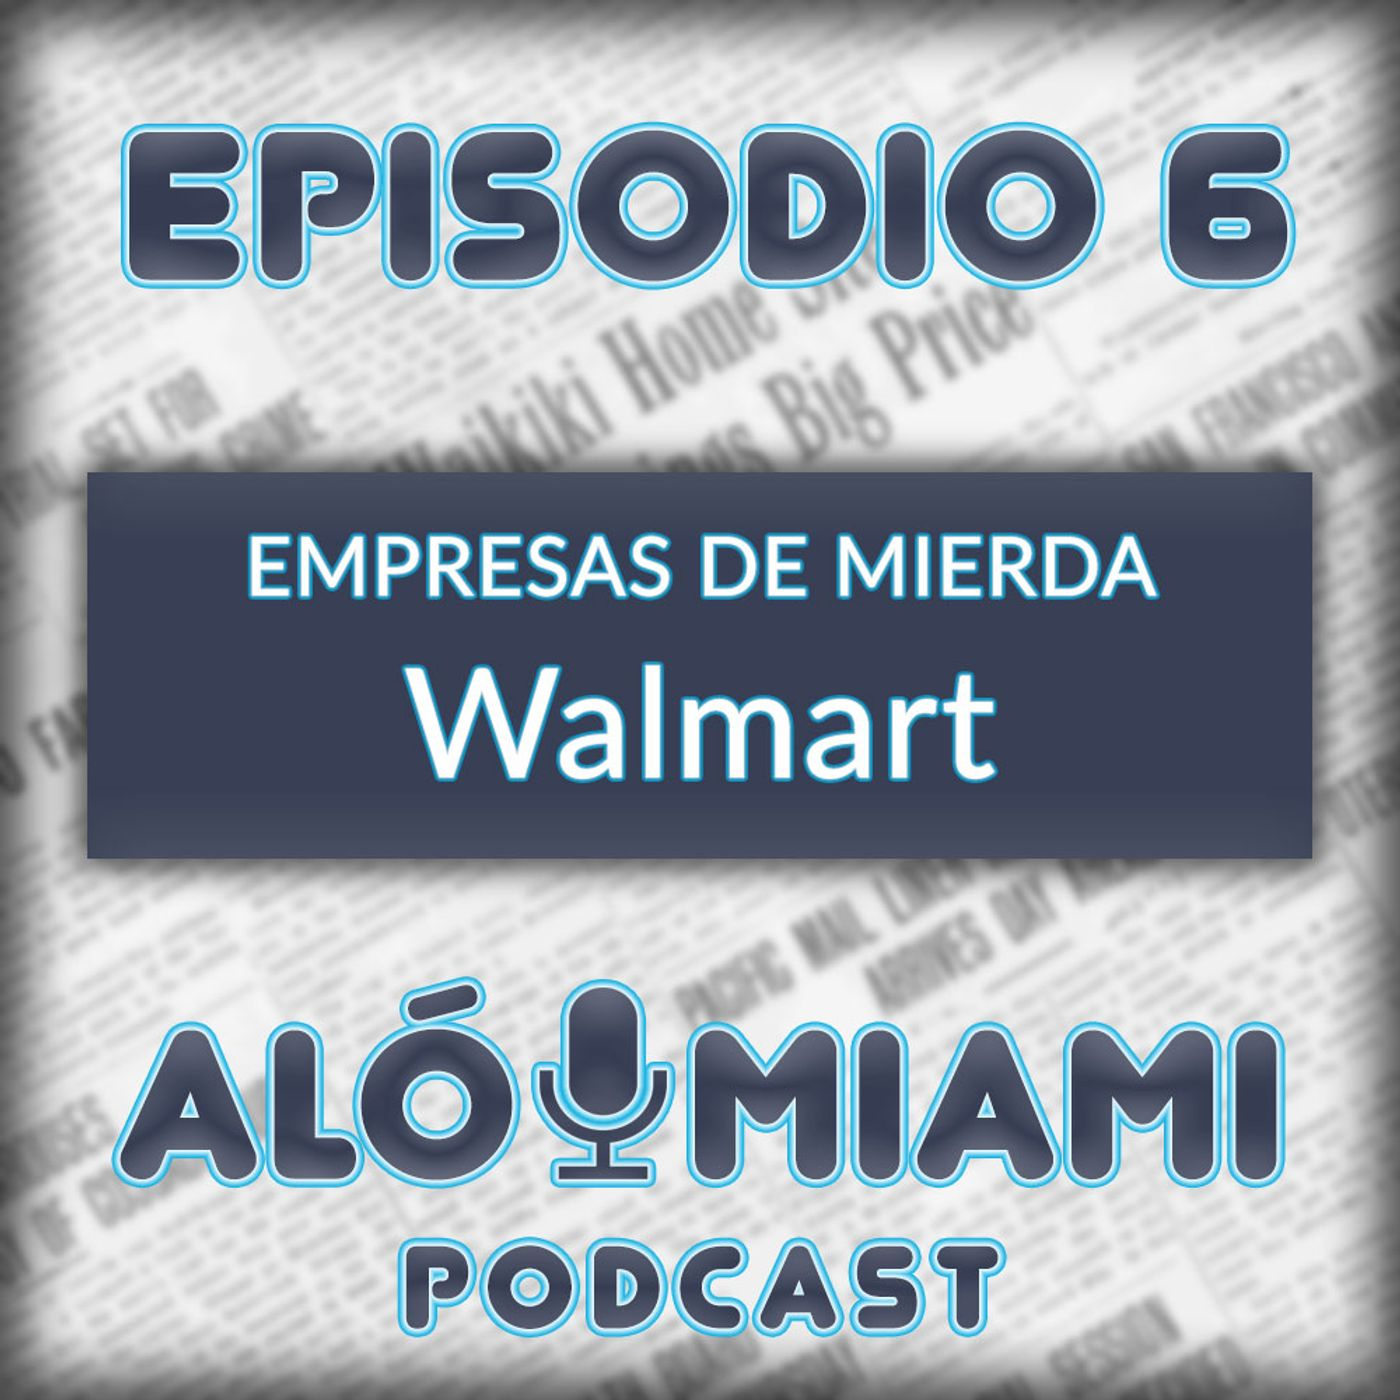 Alo Miami- Ep. 6 - Empresas de mierda: Walmart